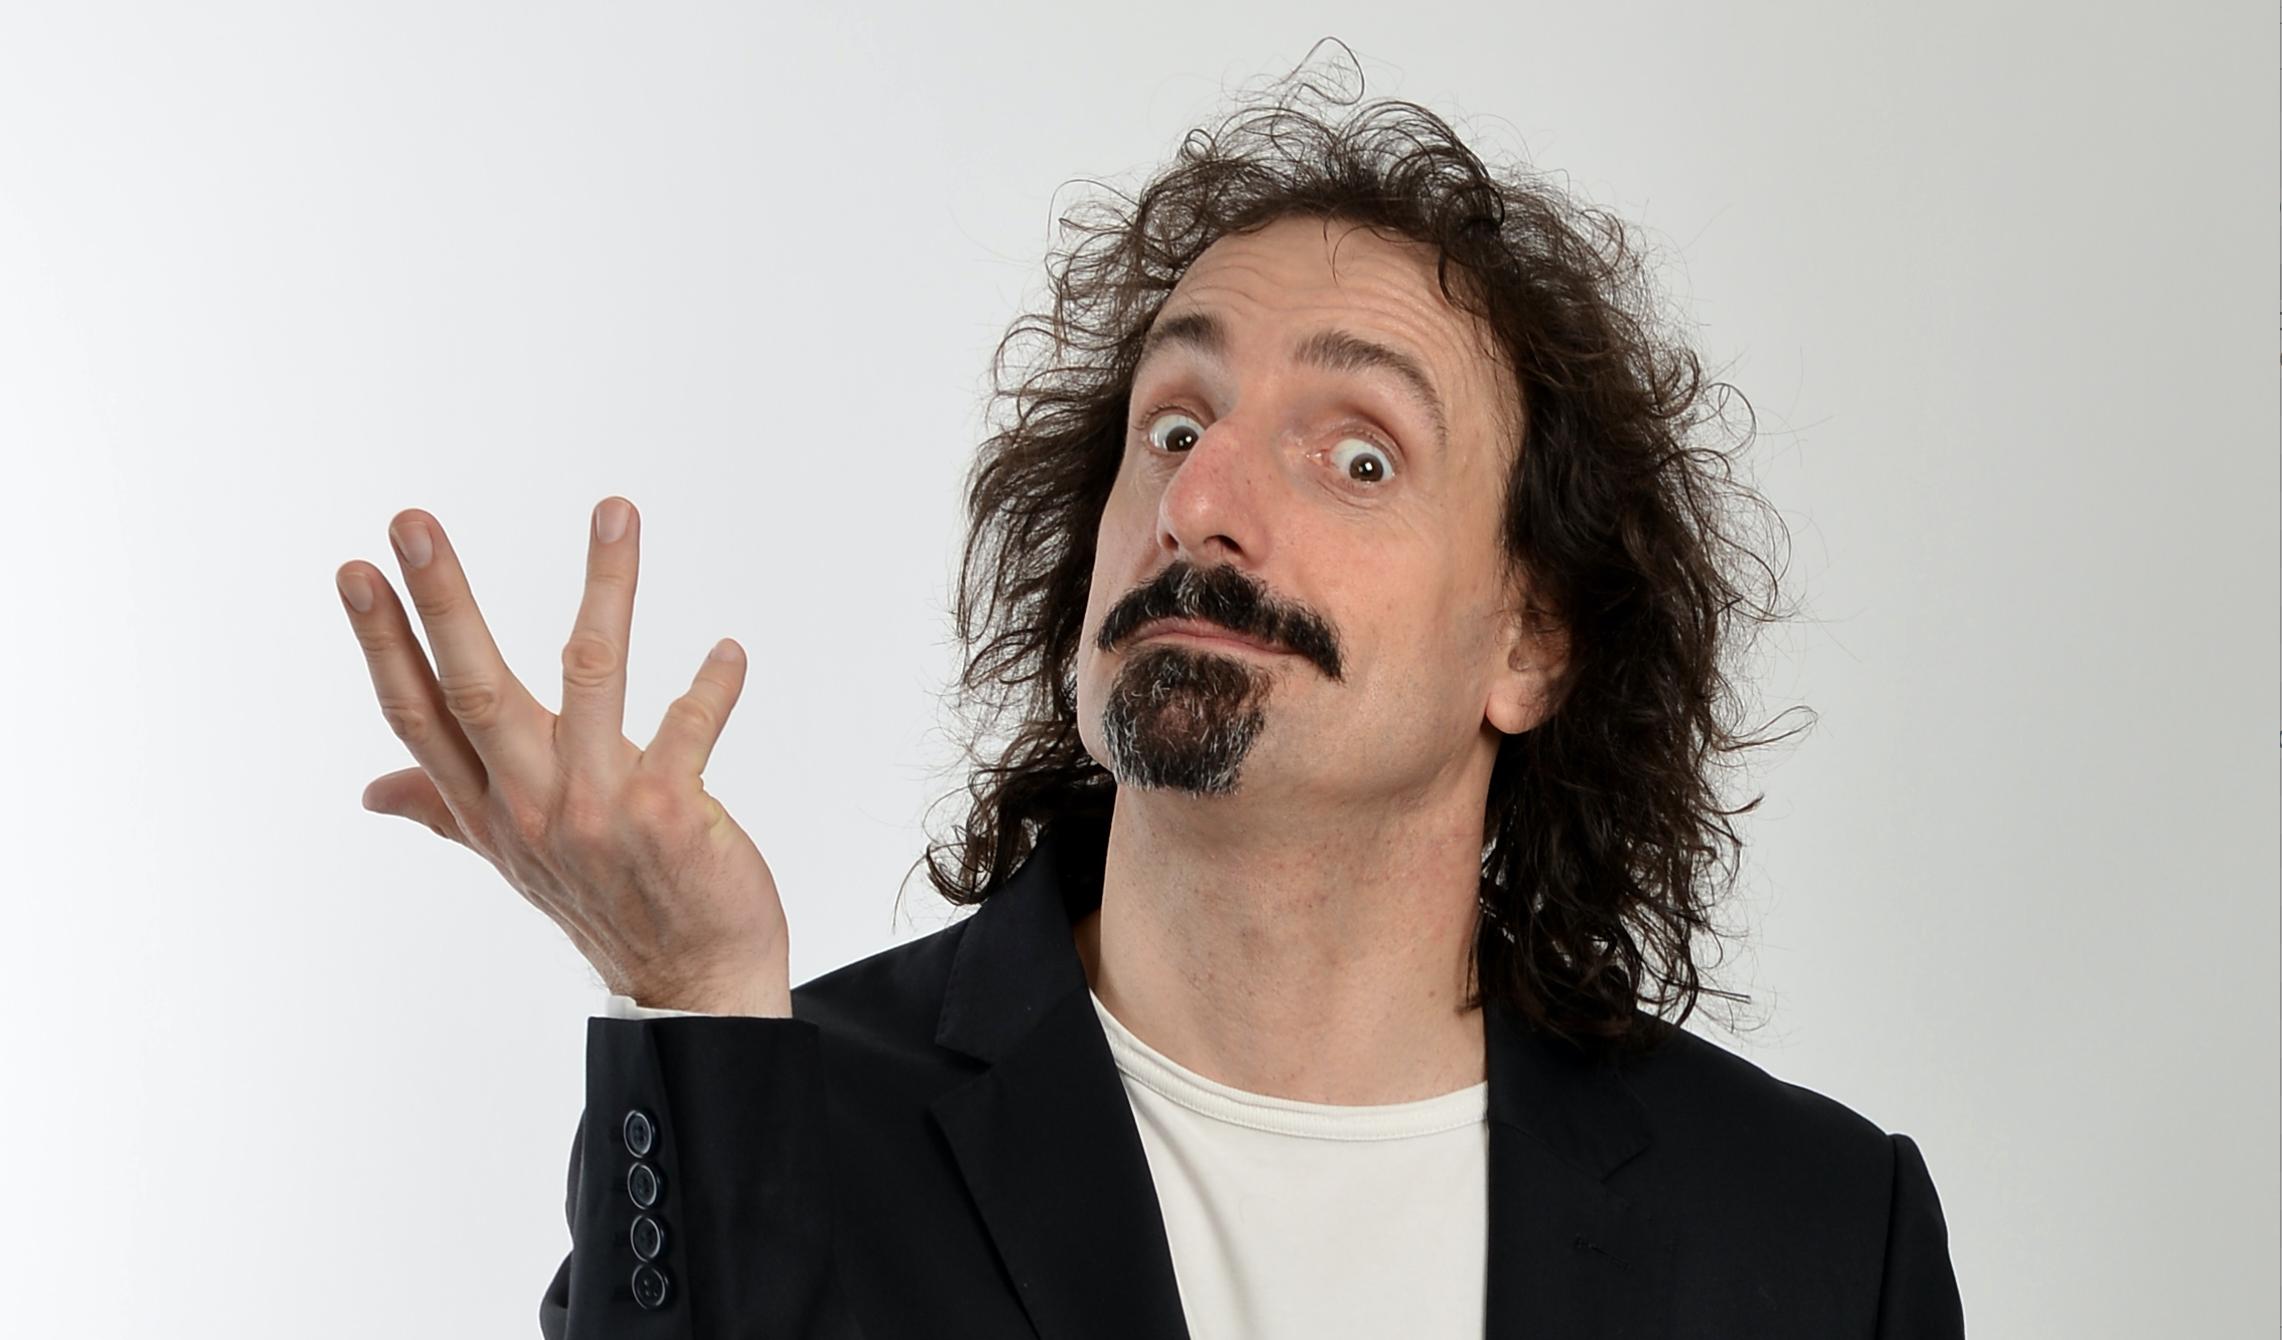 Addy van der borgh comedian jokepit comedy